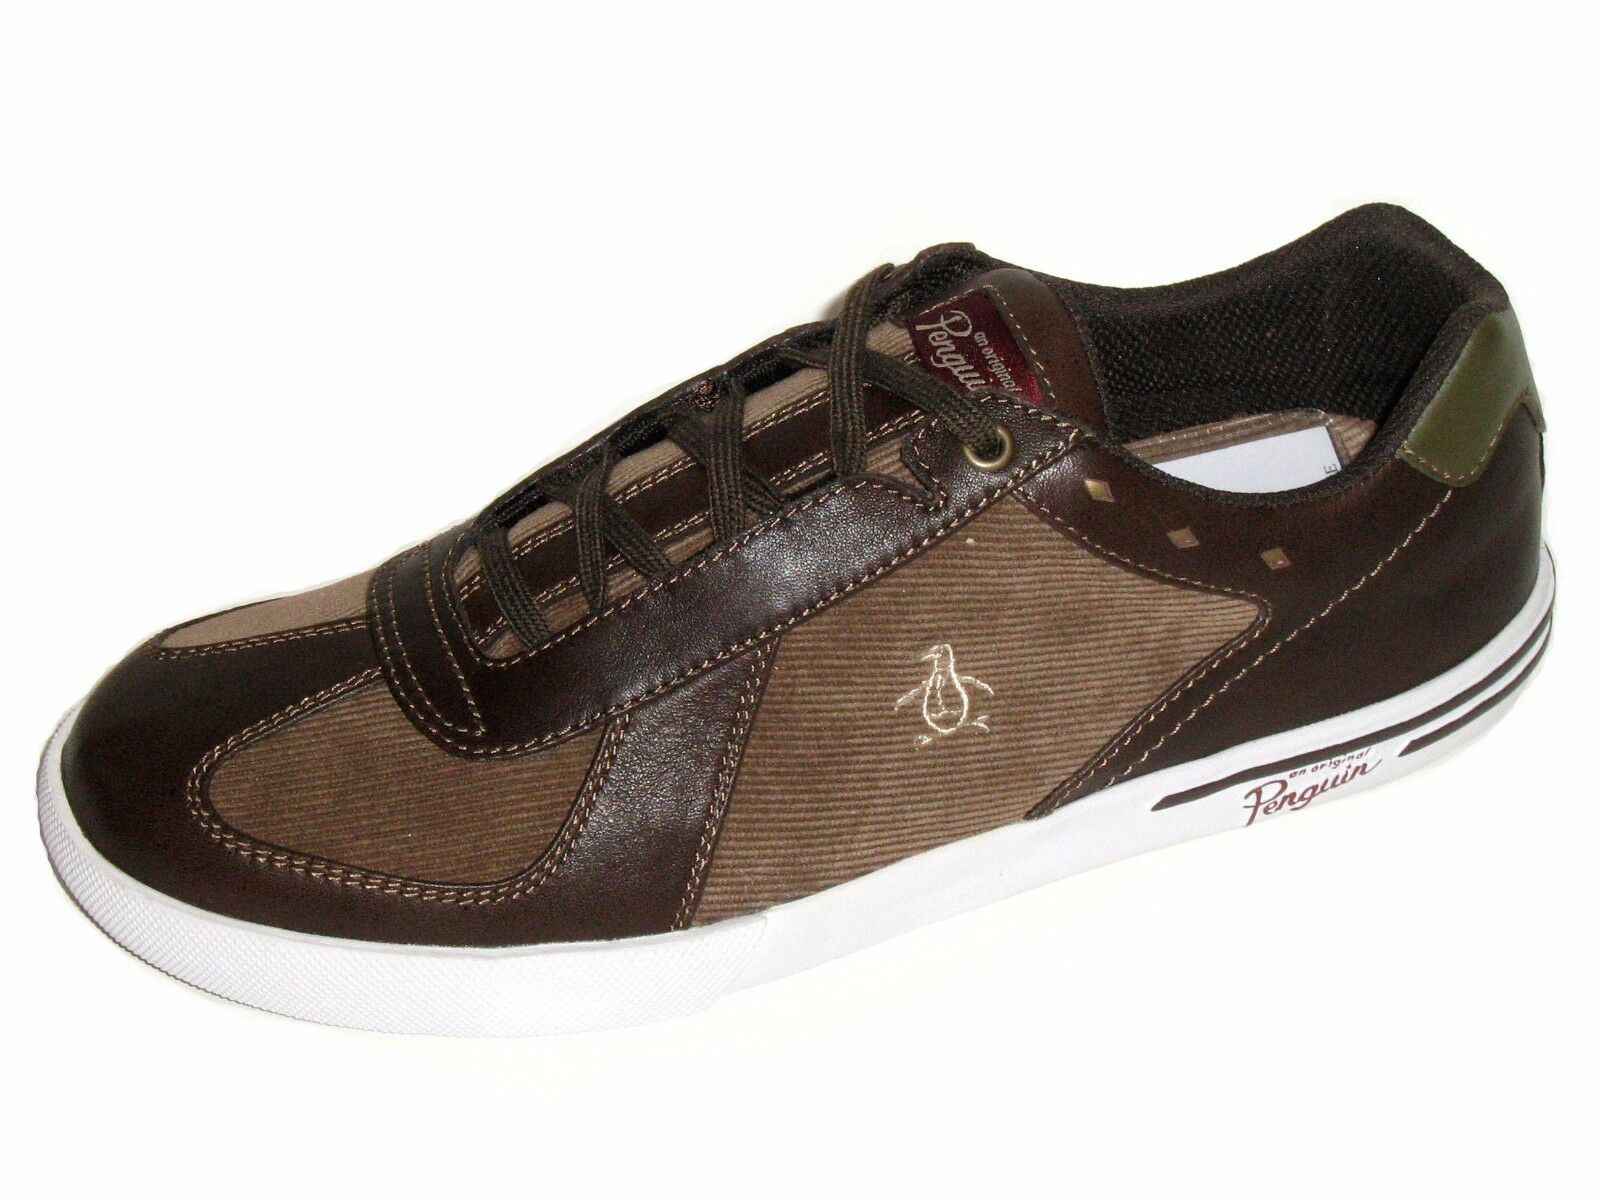 Original Penguin Men's shoes Mix Cord Lace Up Fashion Sneaker Dark Brown Size 9